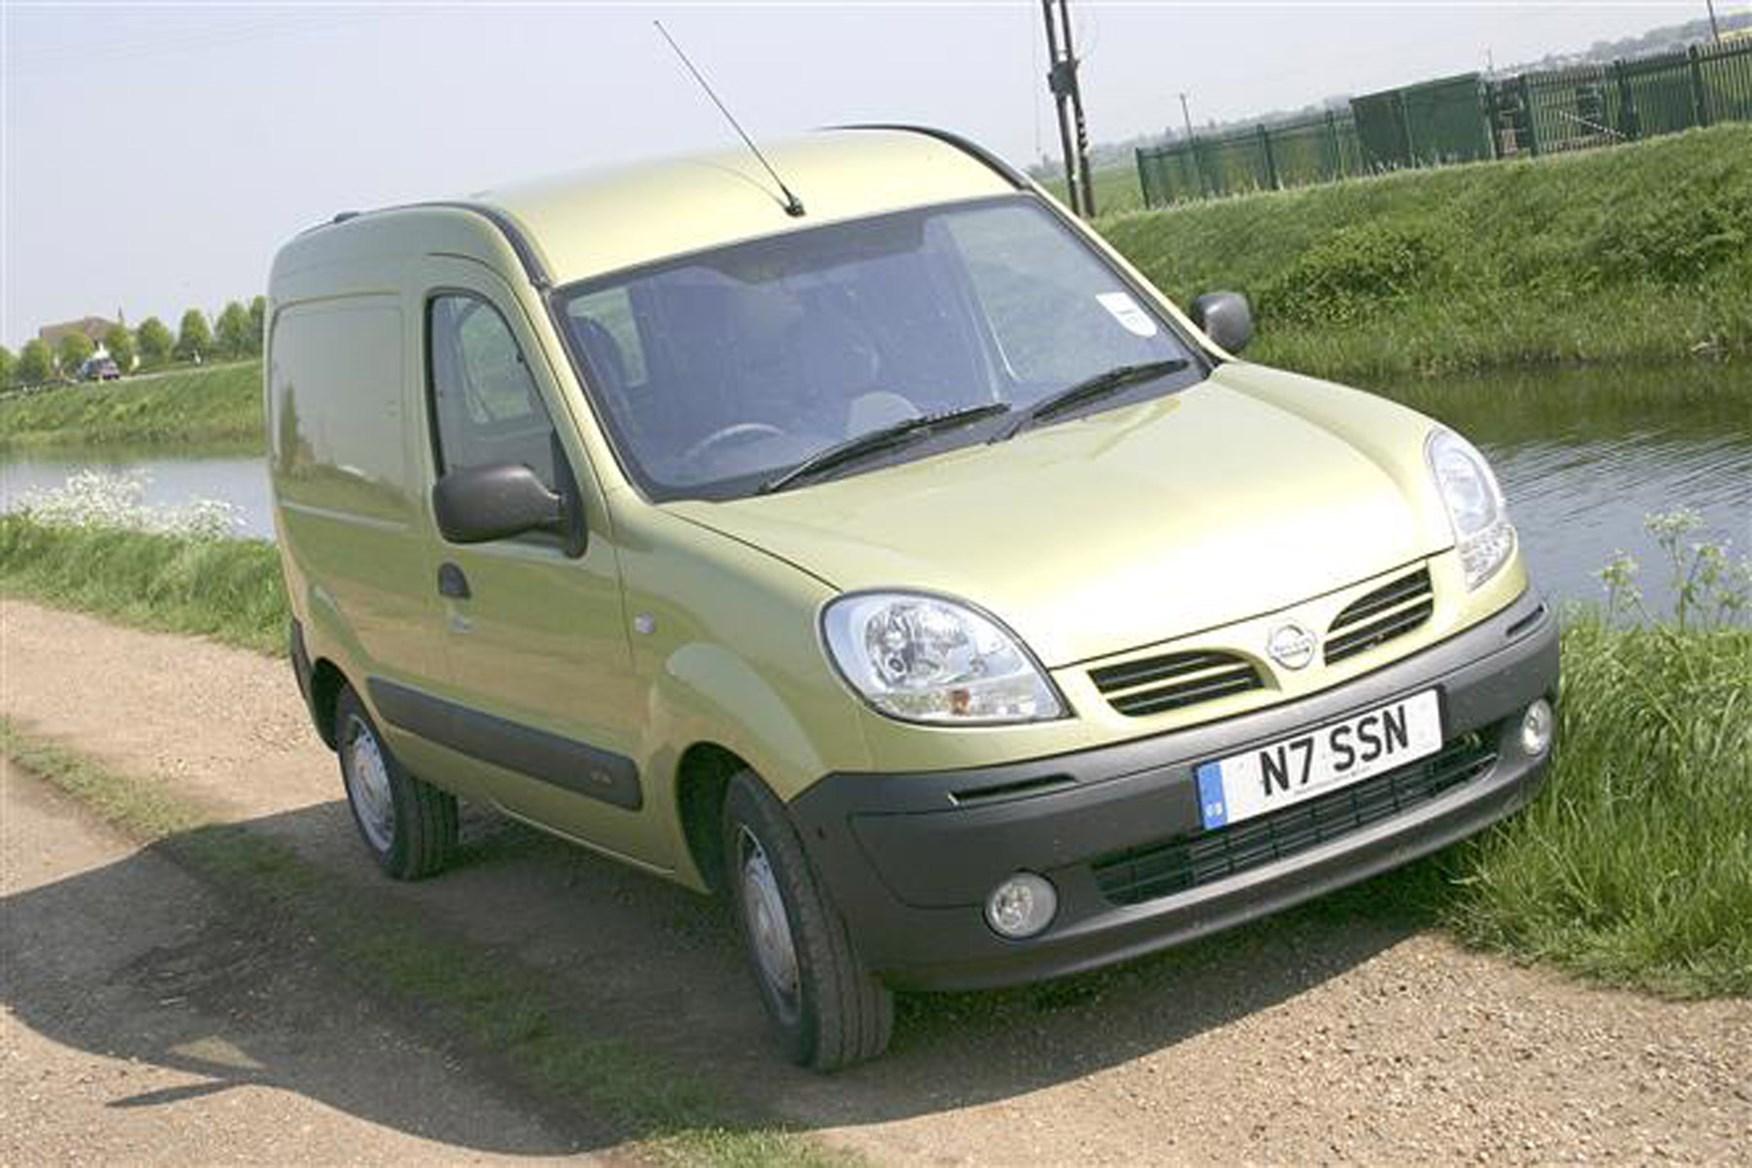 Nissan Kubistar review on Parkers Vans - exterior